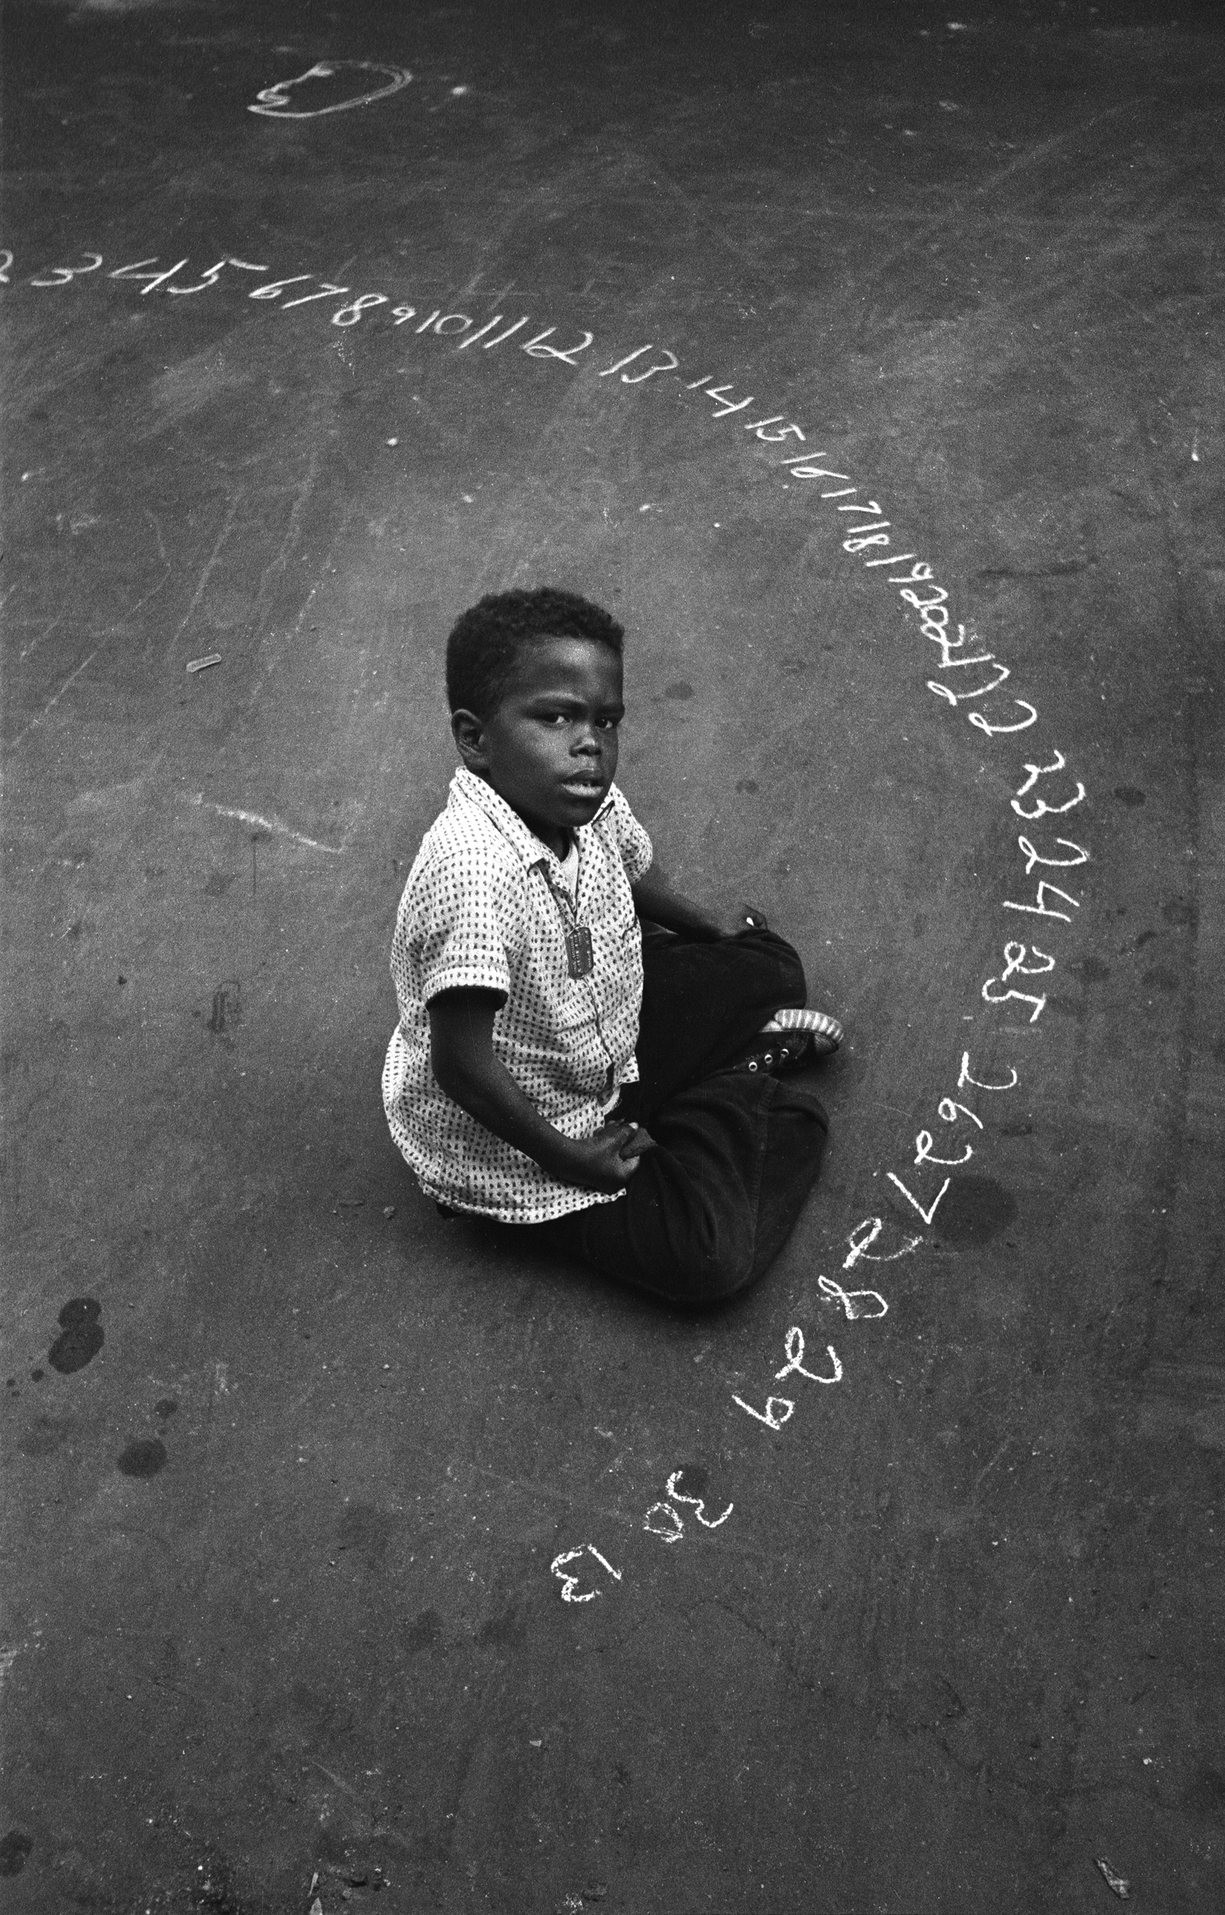 Мальчик с цифрами мелом, 1955. Фотограф Гарольд Файнштейн